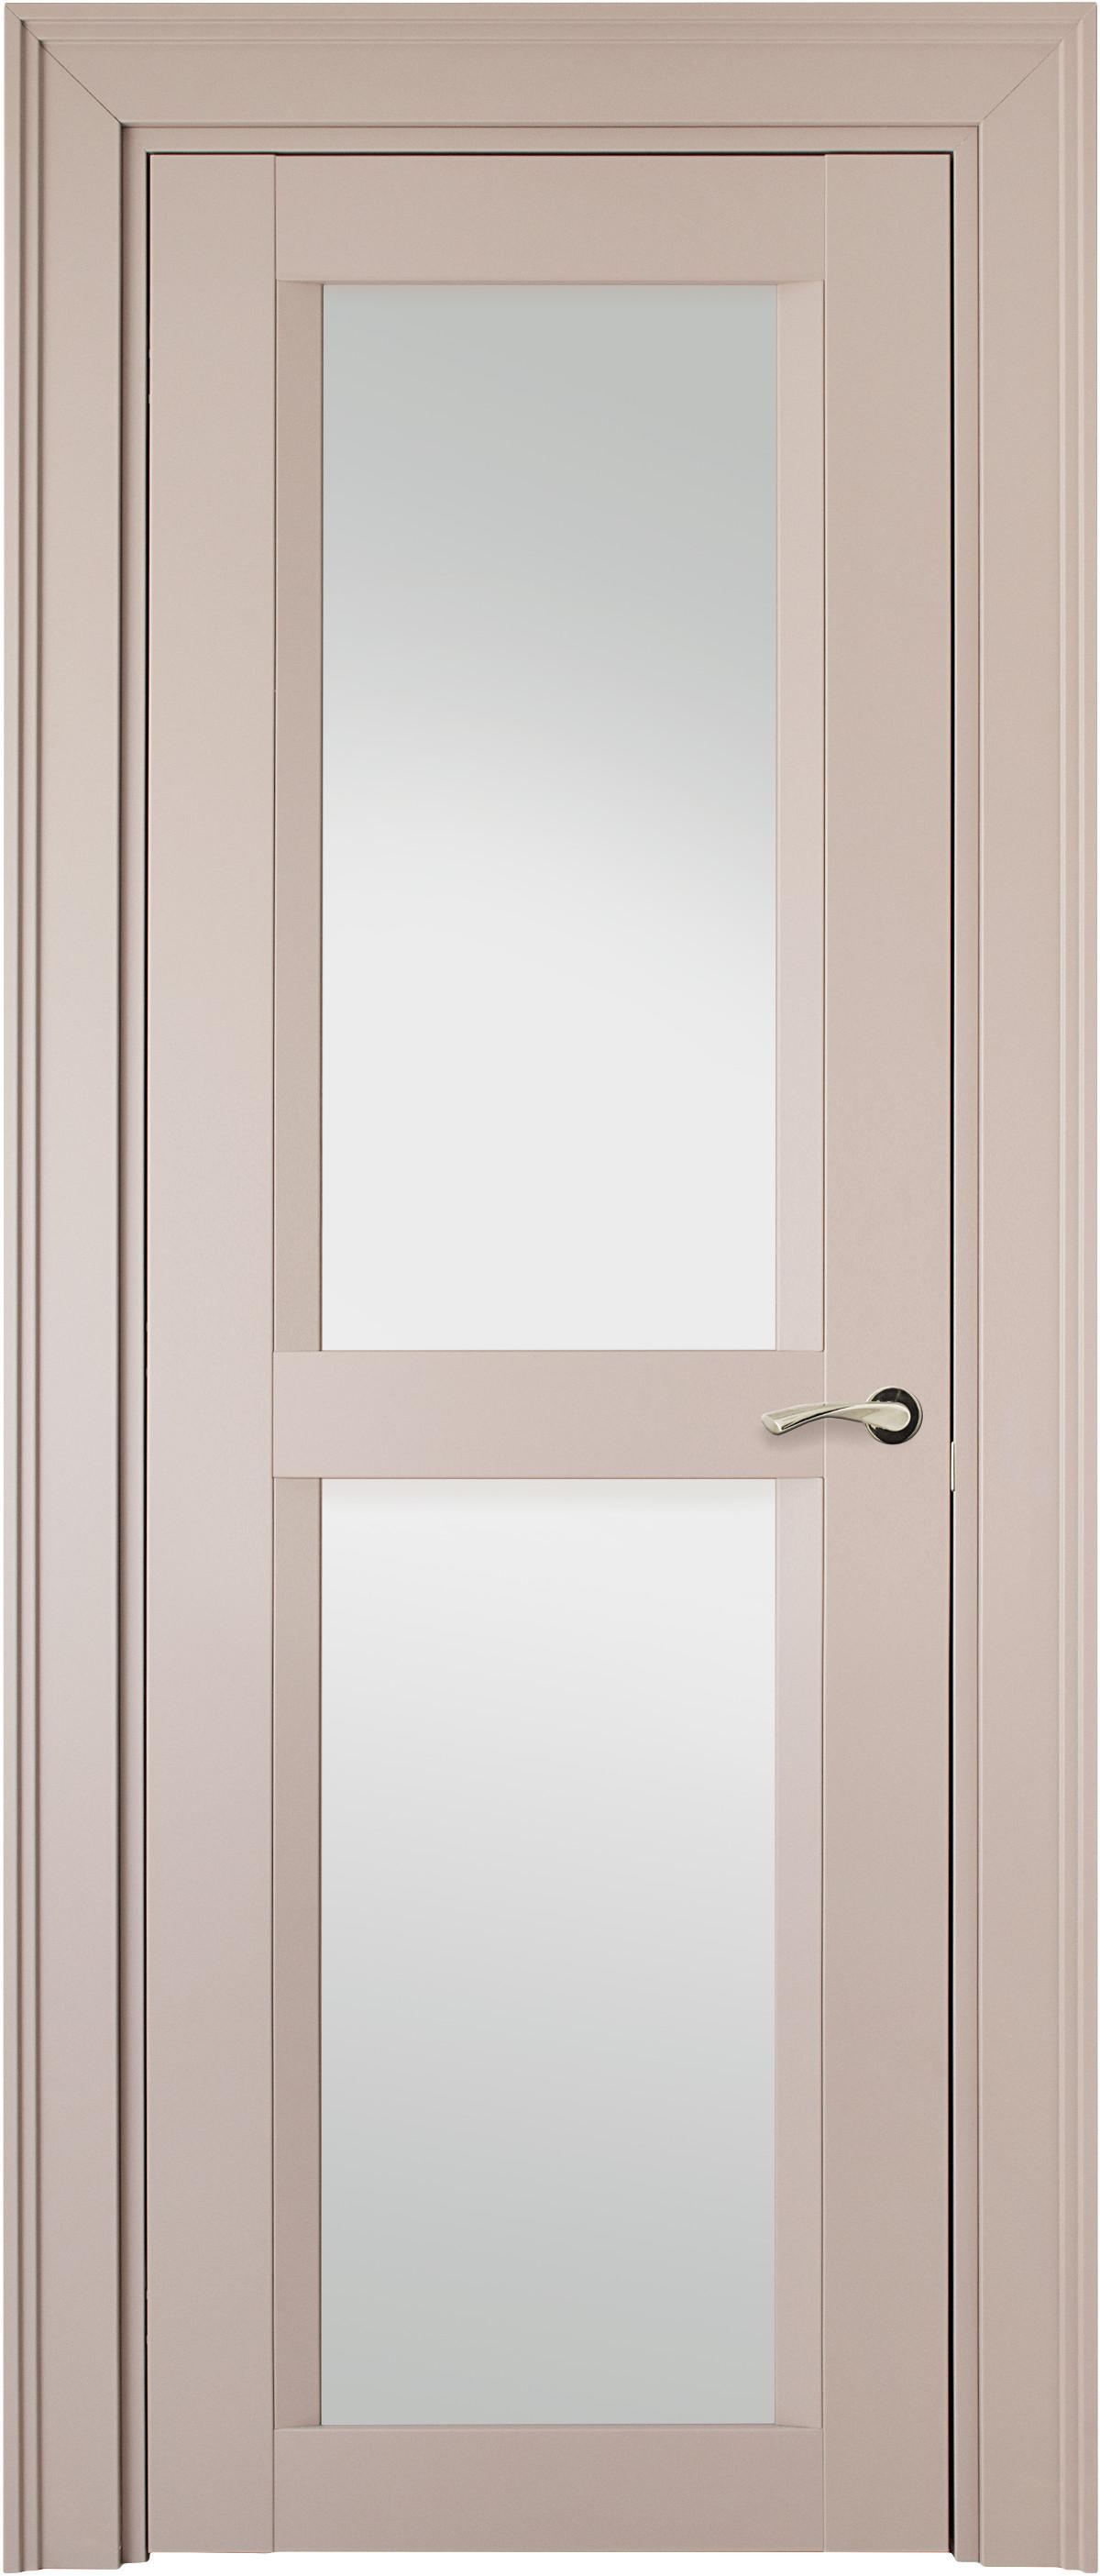 Межкомнатные двери Scala 2S-1